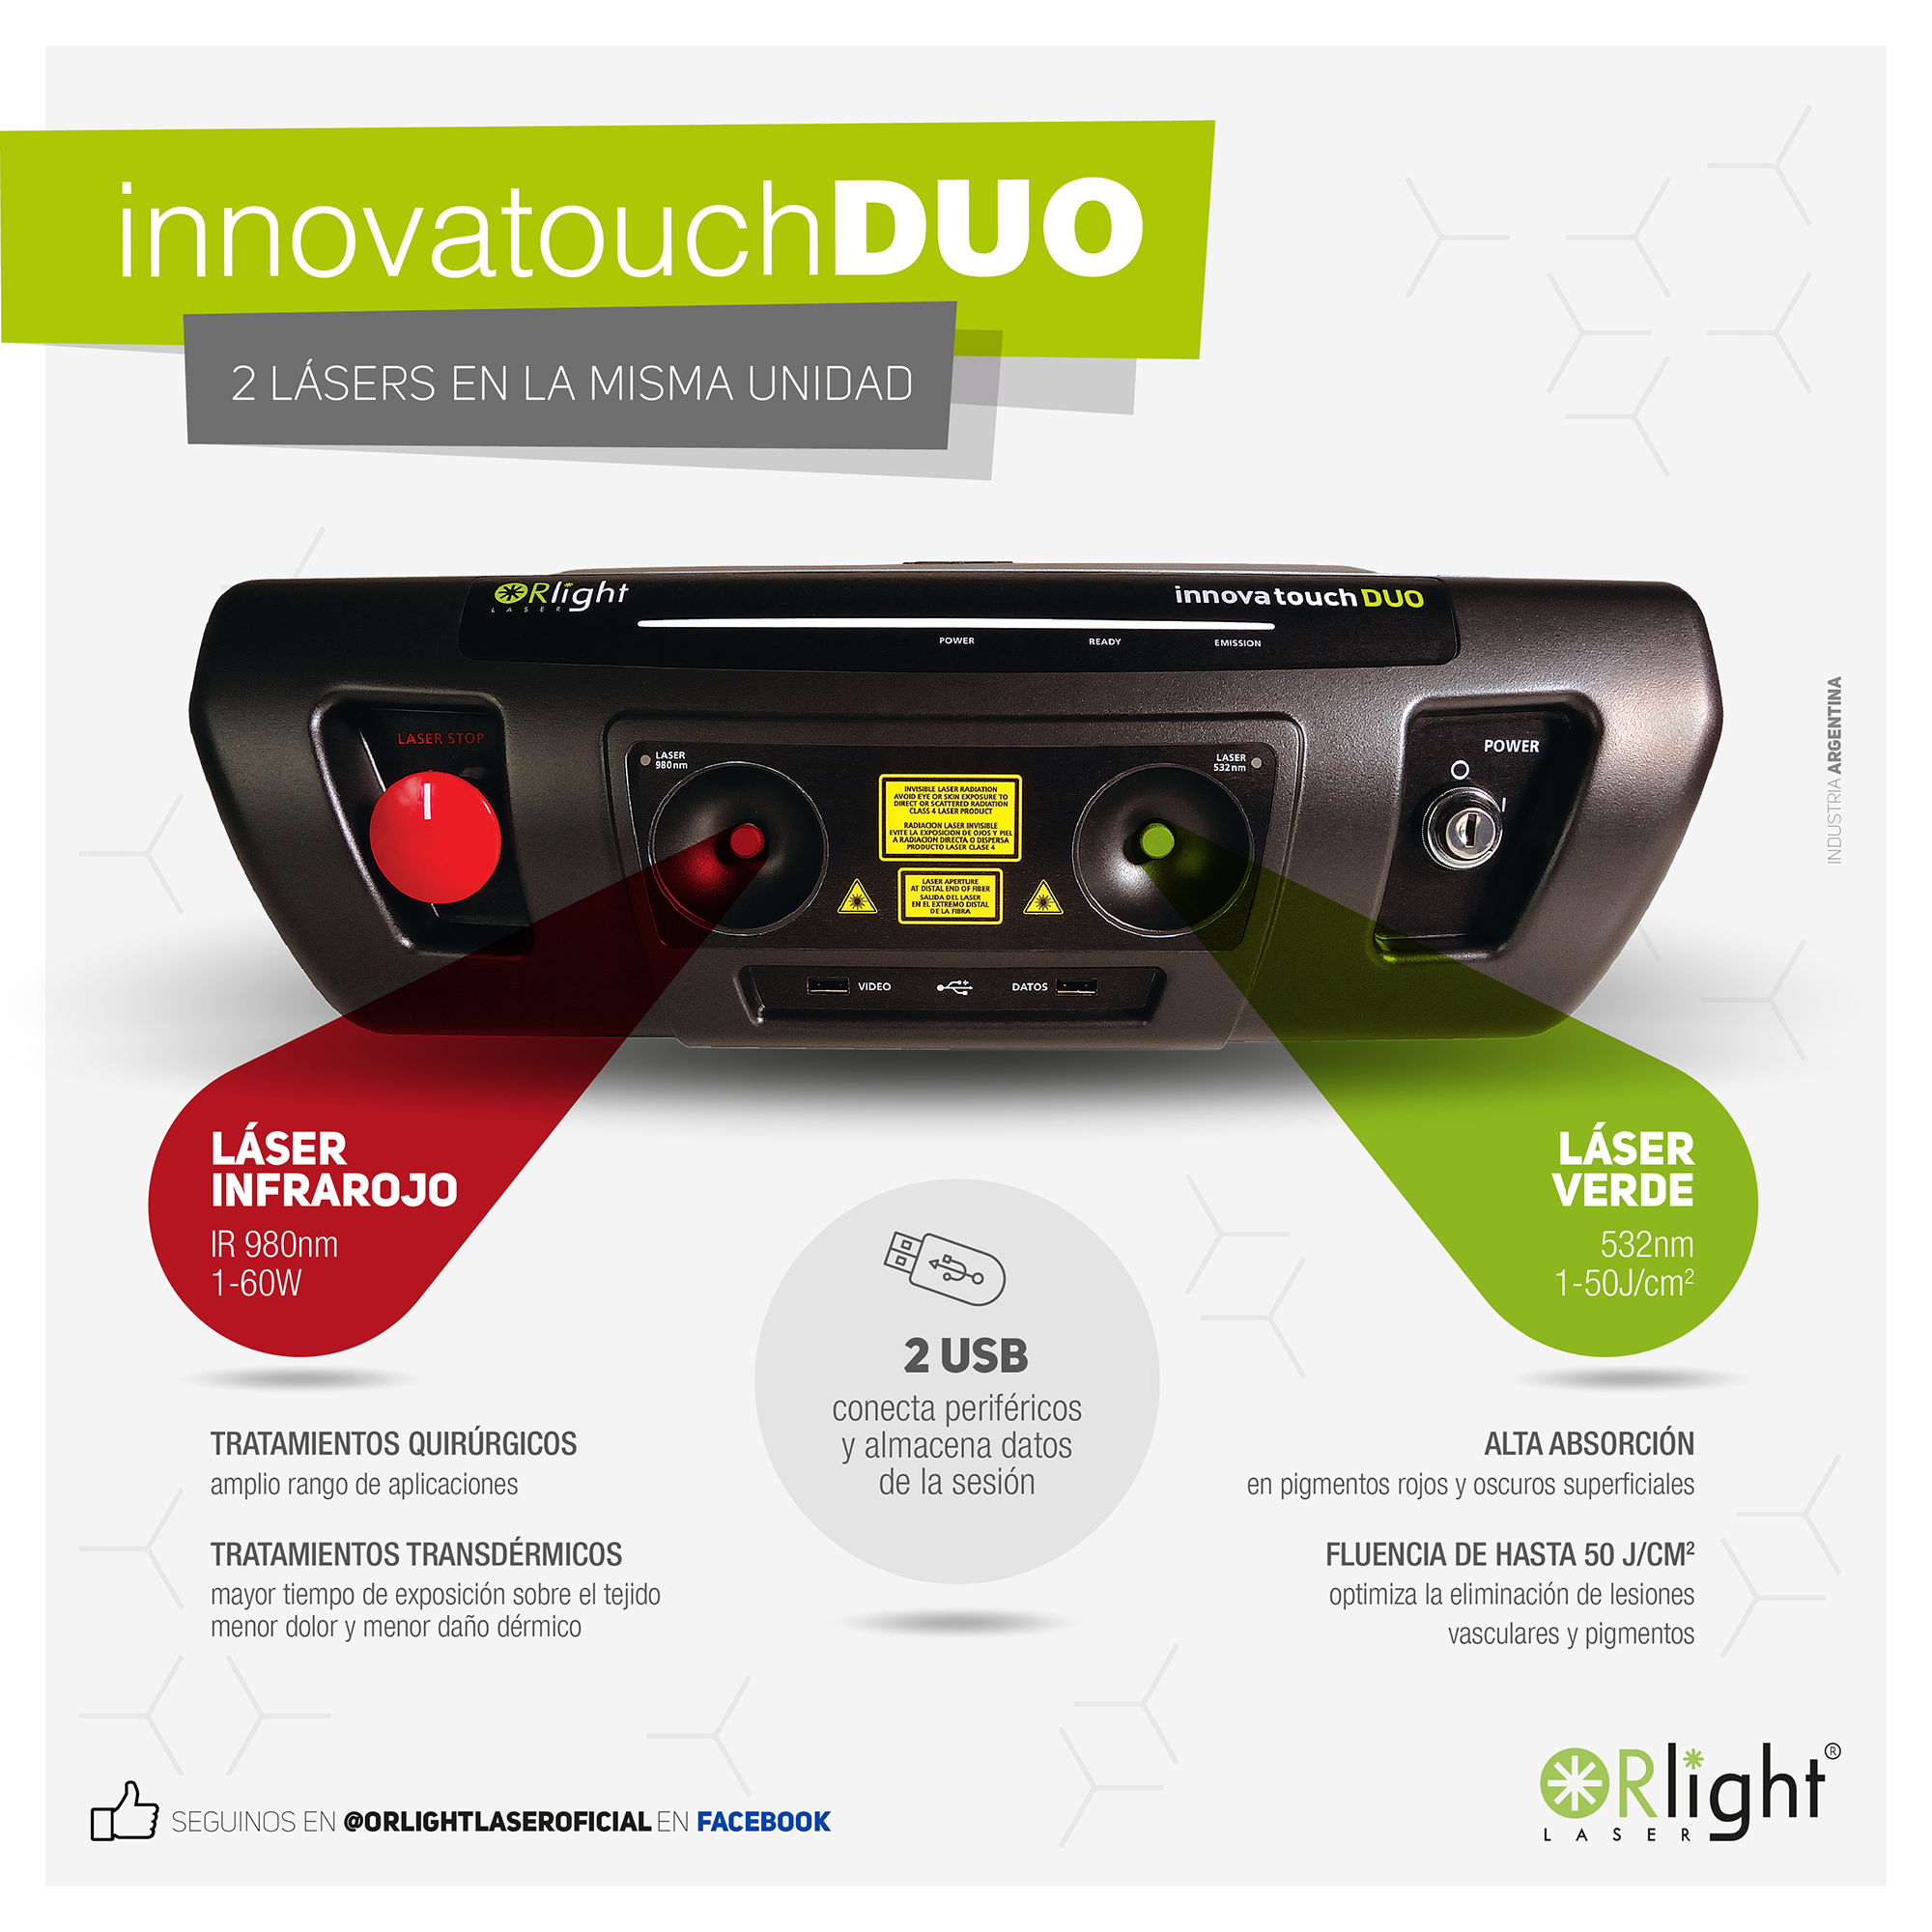 Innova Touch DUO - Longitudes de Onda